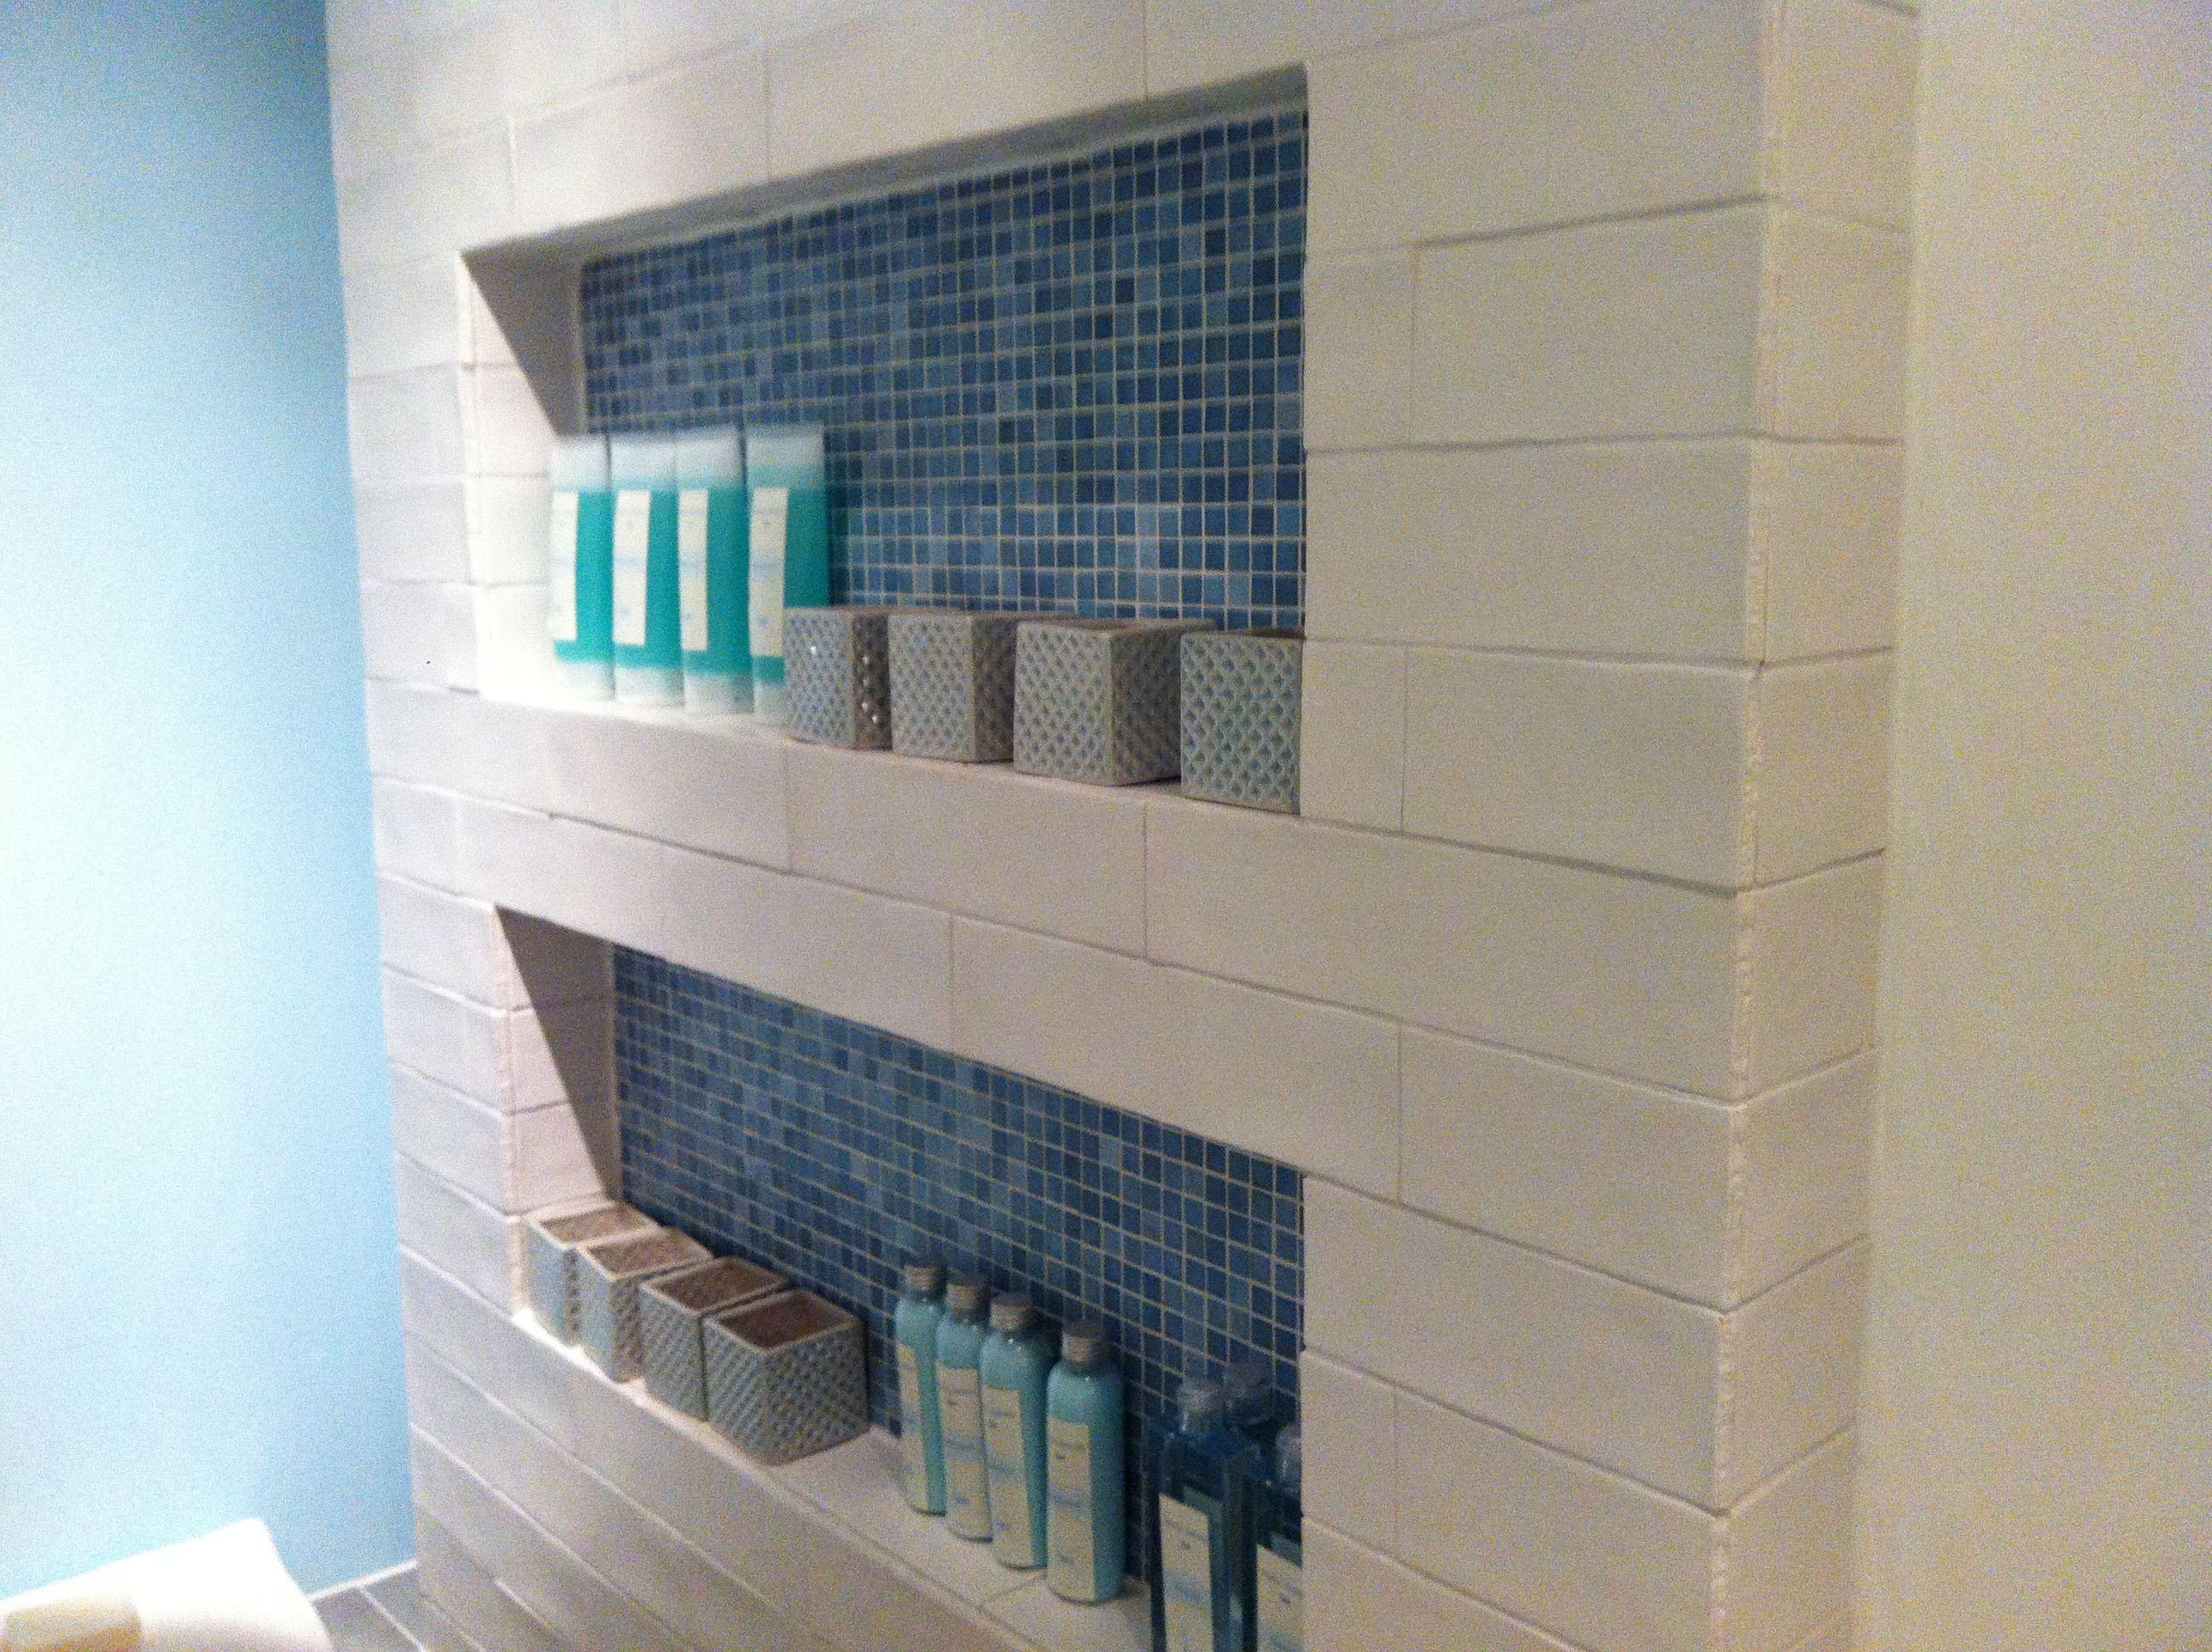 Backsplash tiles 7.5 x 30 cm Brugman badkamer - Amsterdam | Bad ...